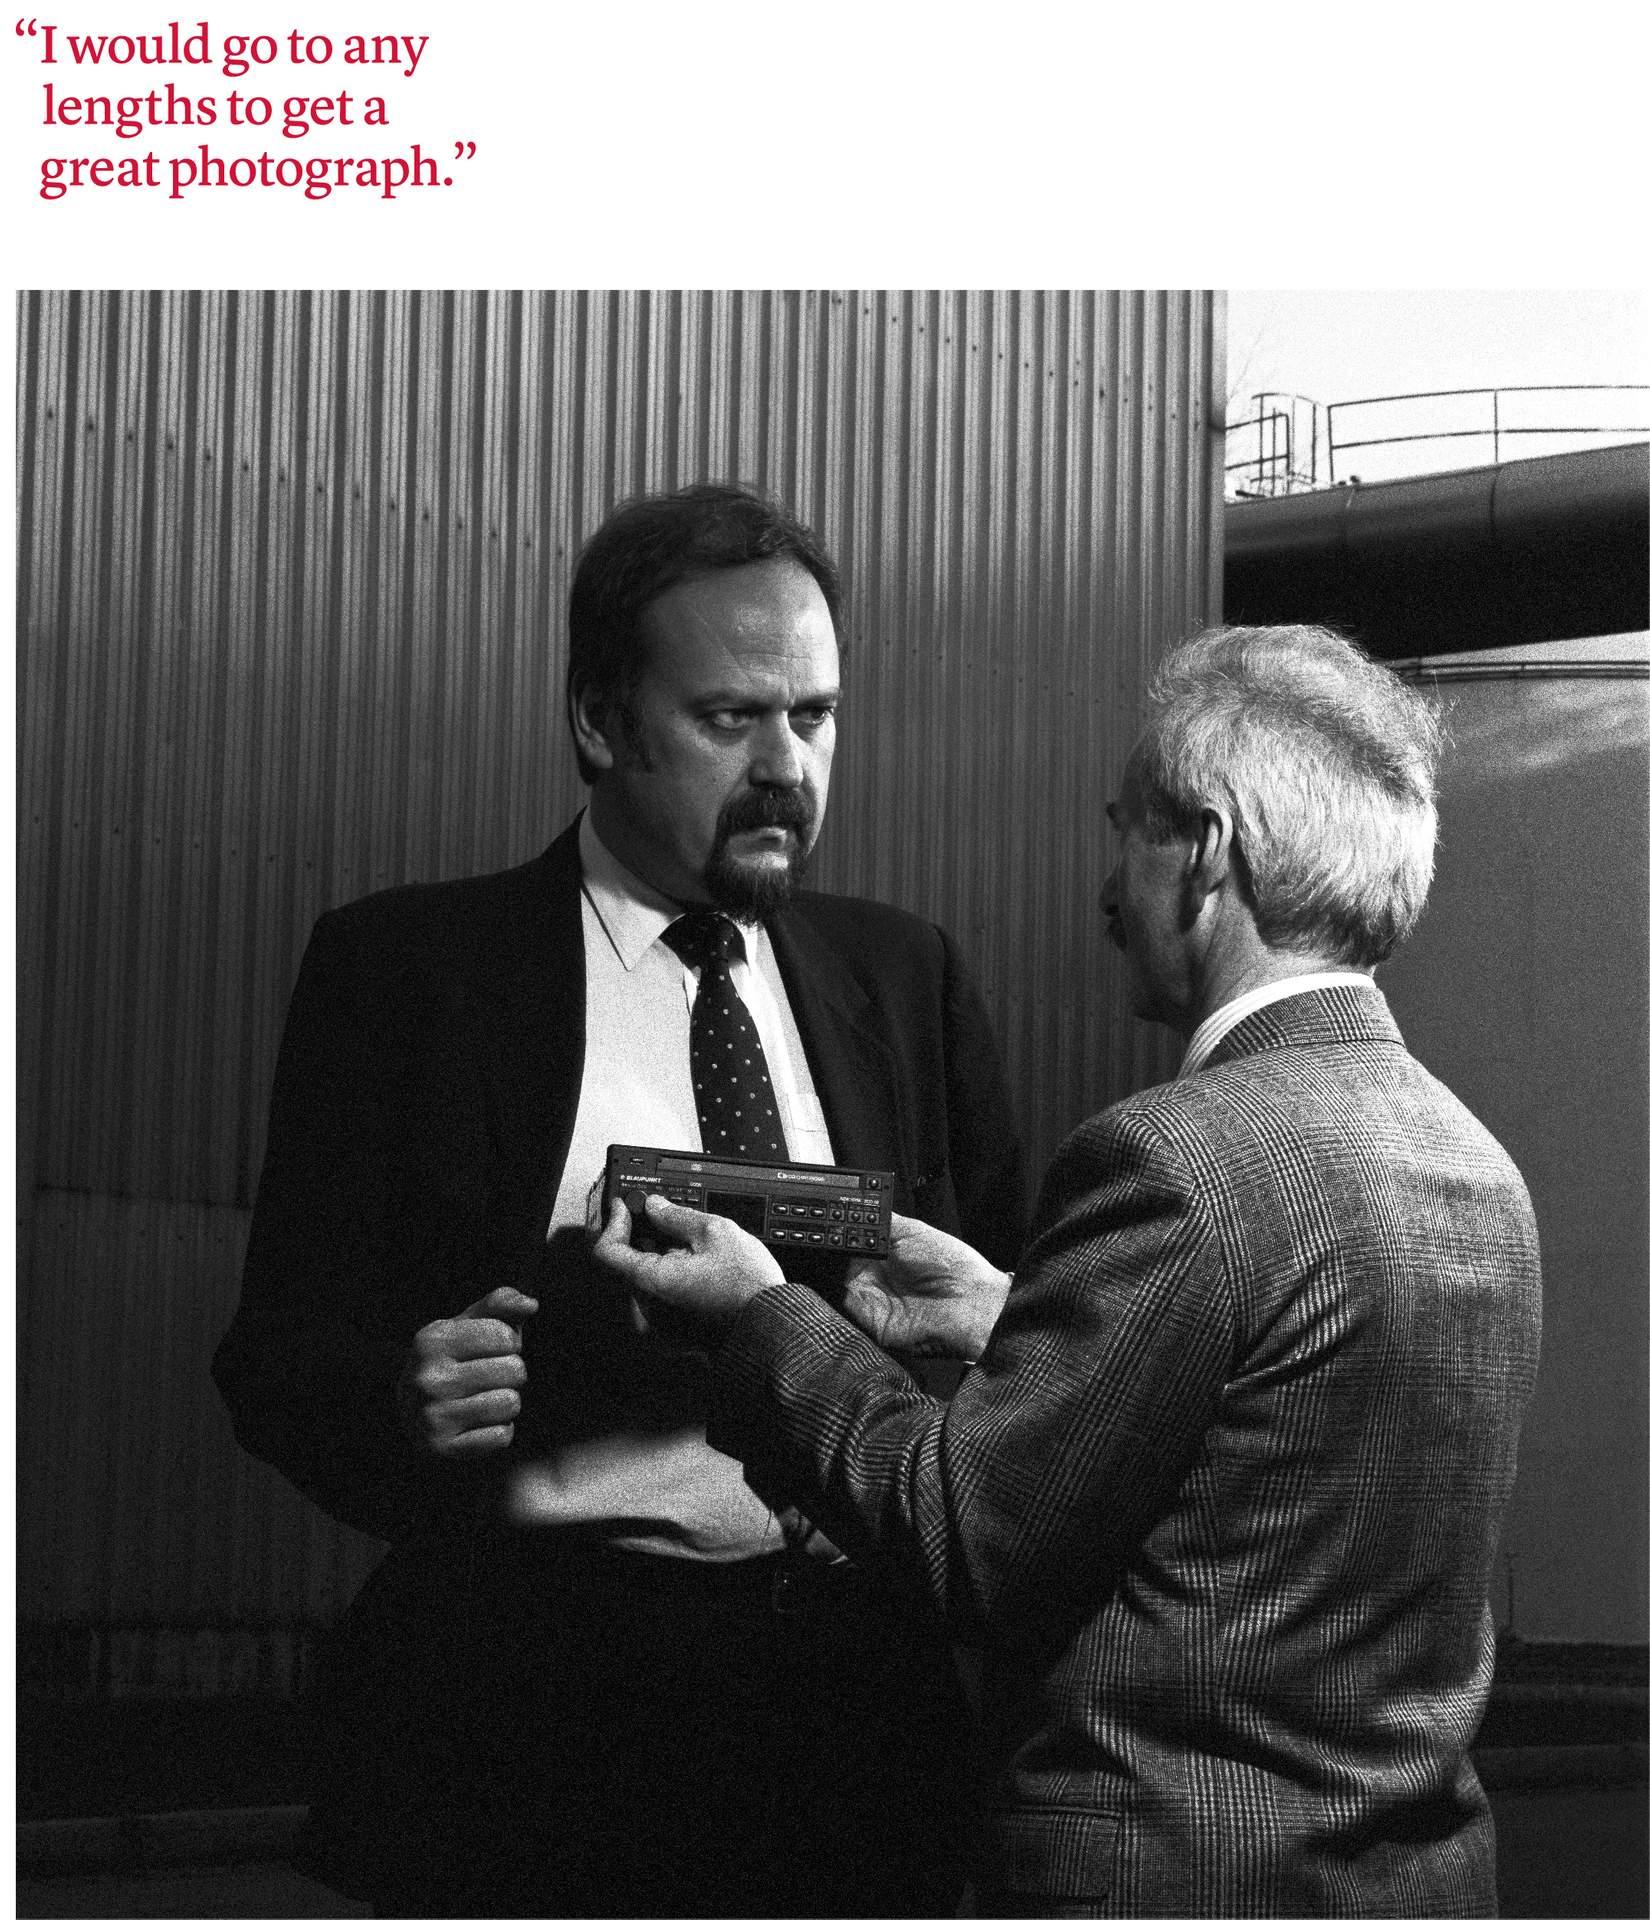 Dr. Helmut Stein, Development Manager of Automobile Radios, 1988